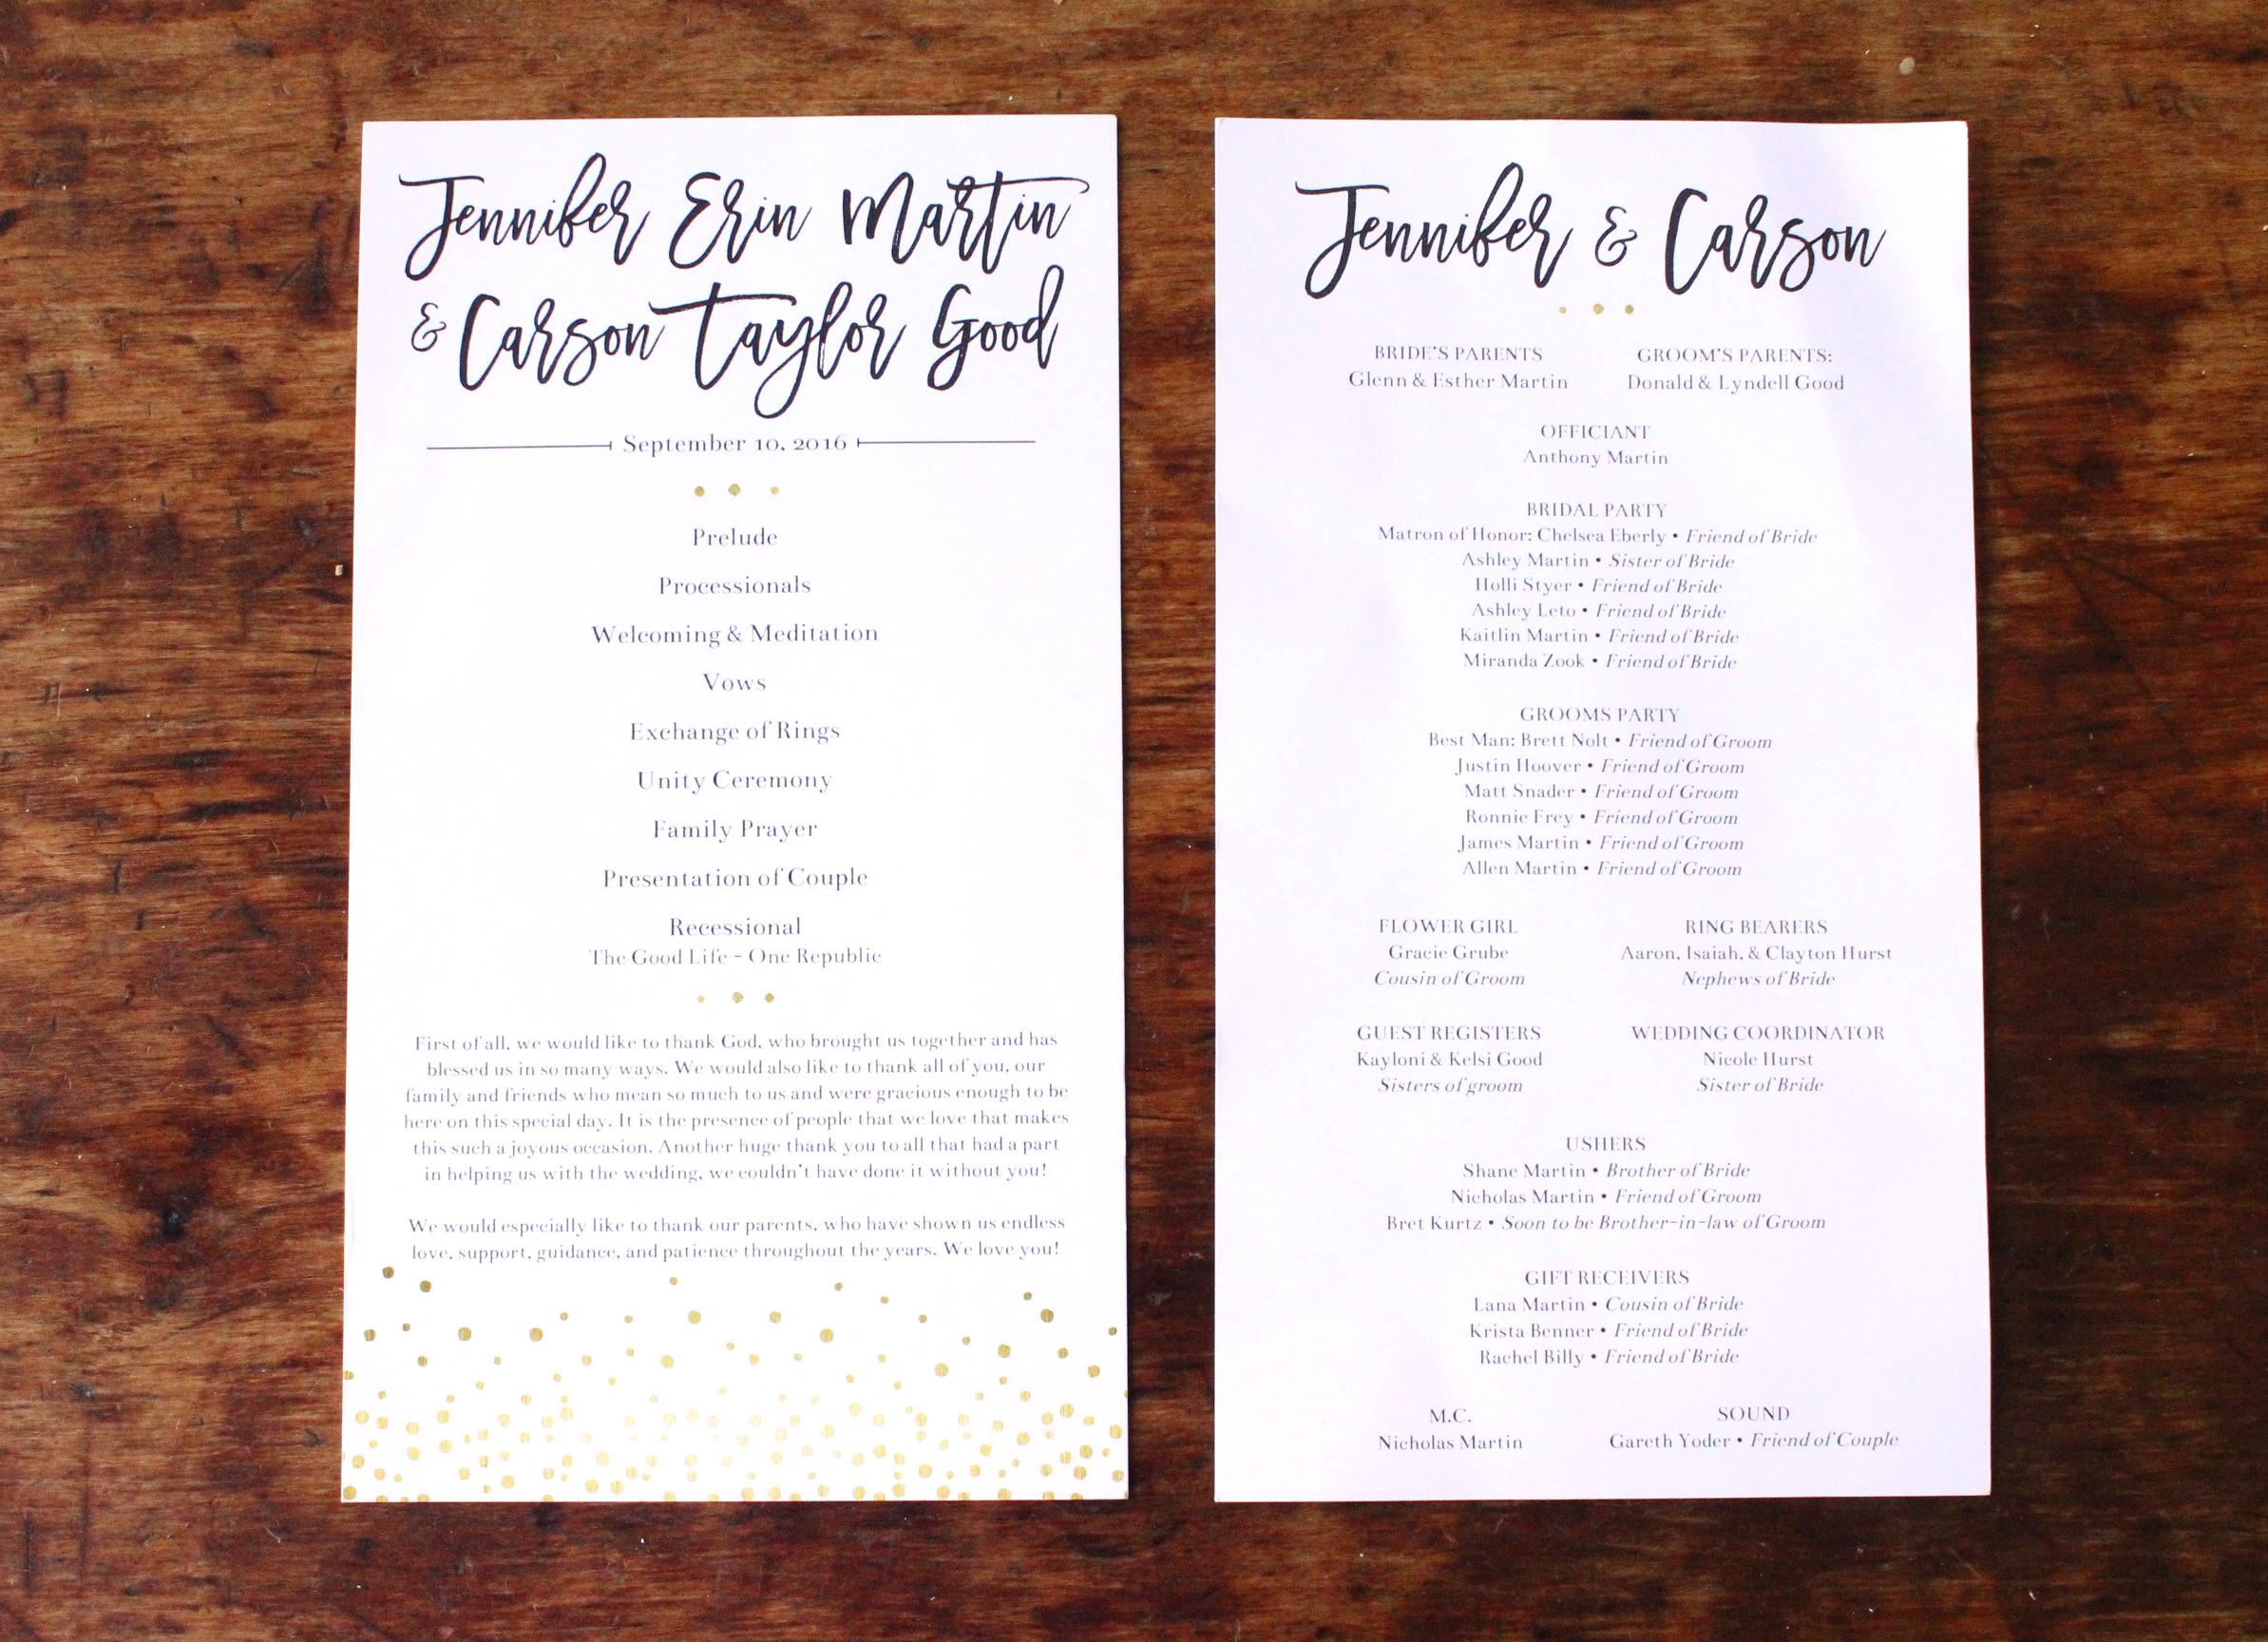 jen & carson   program   (front/back)